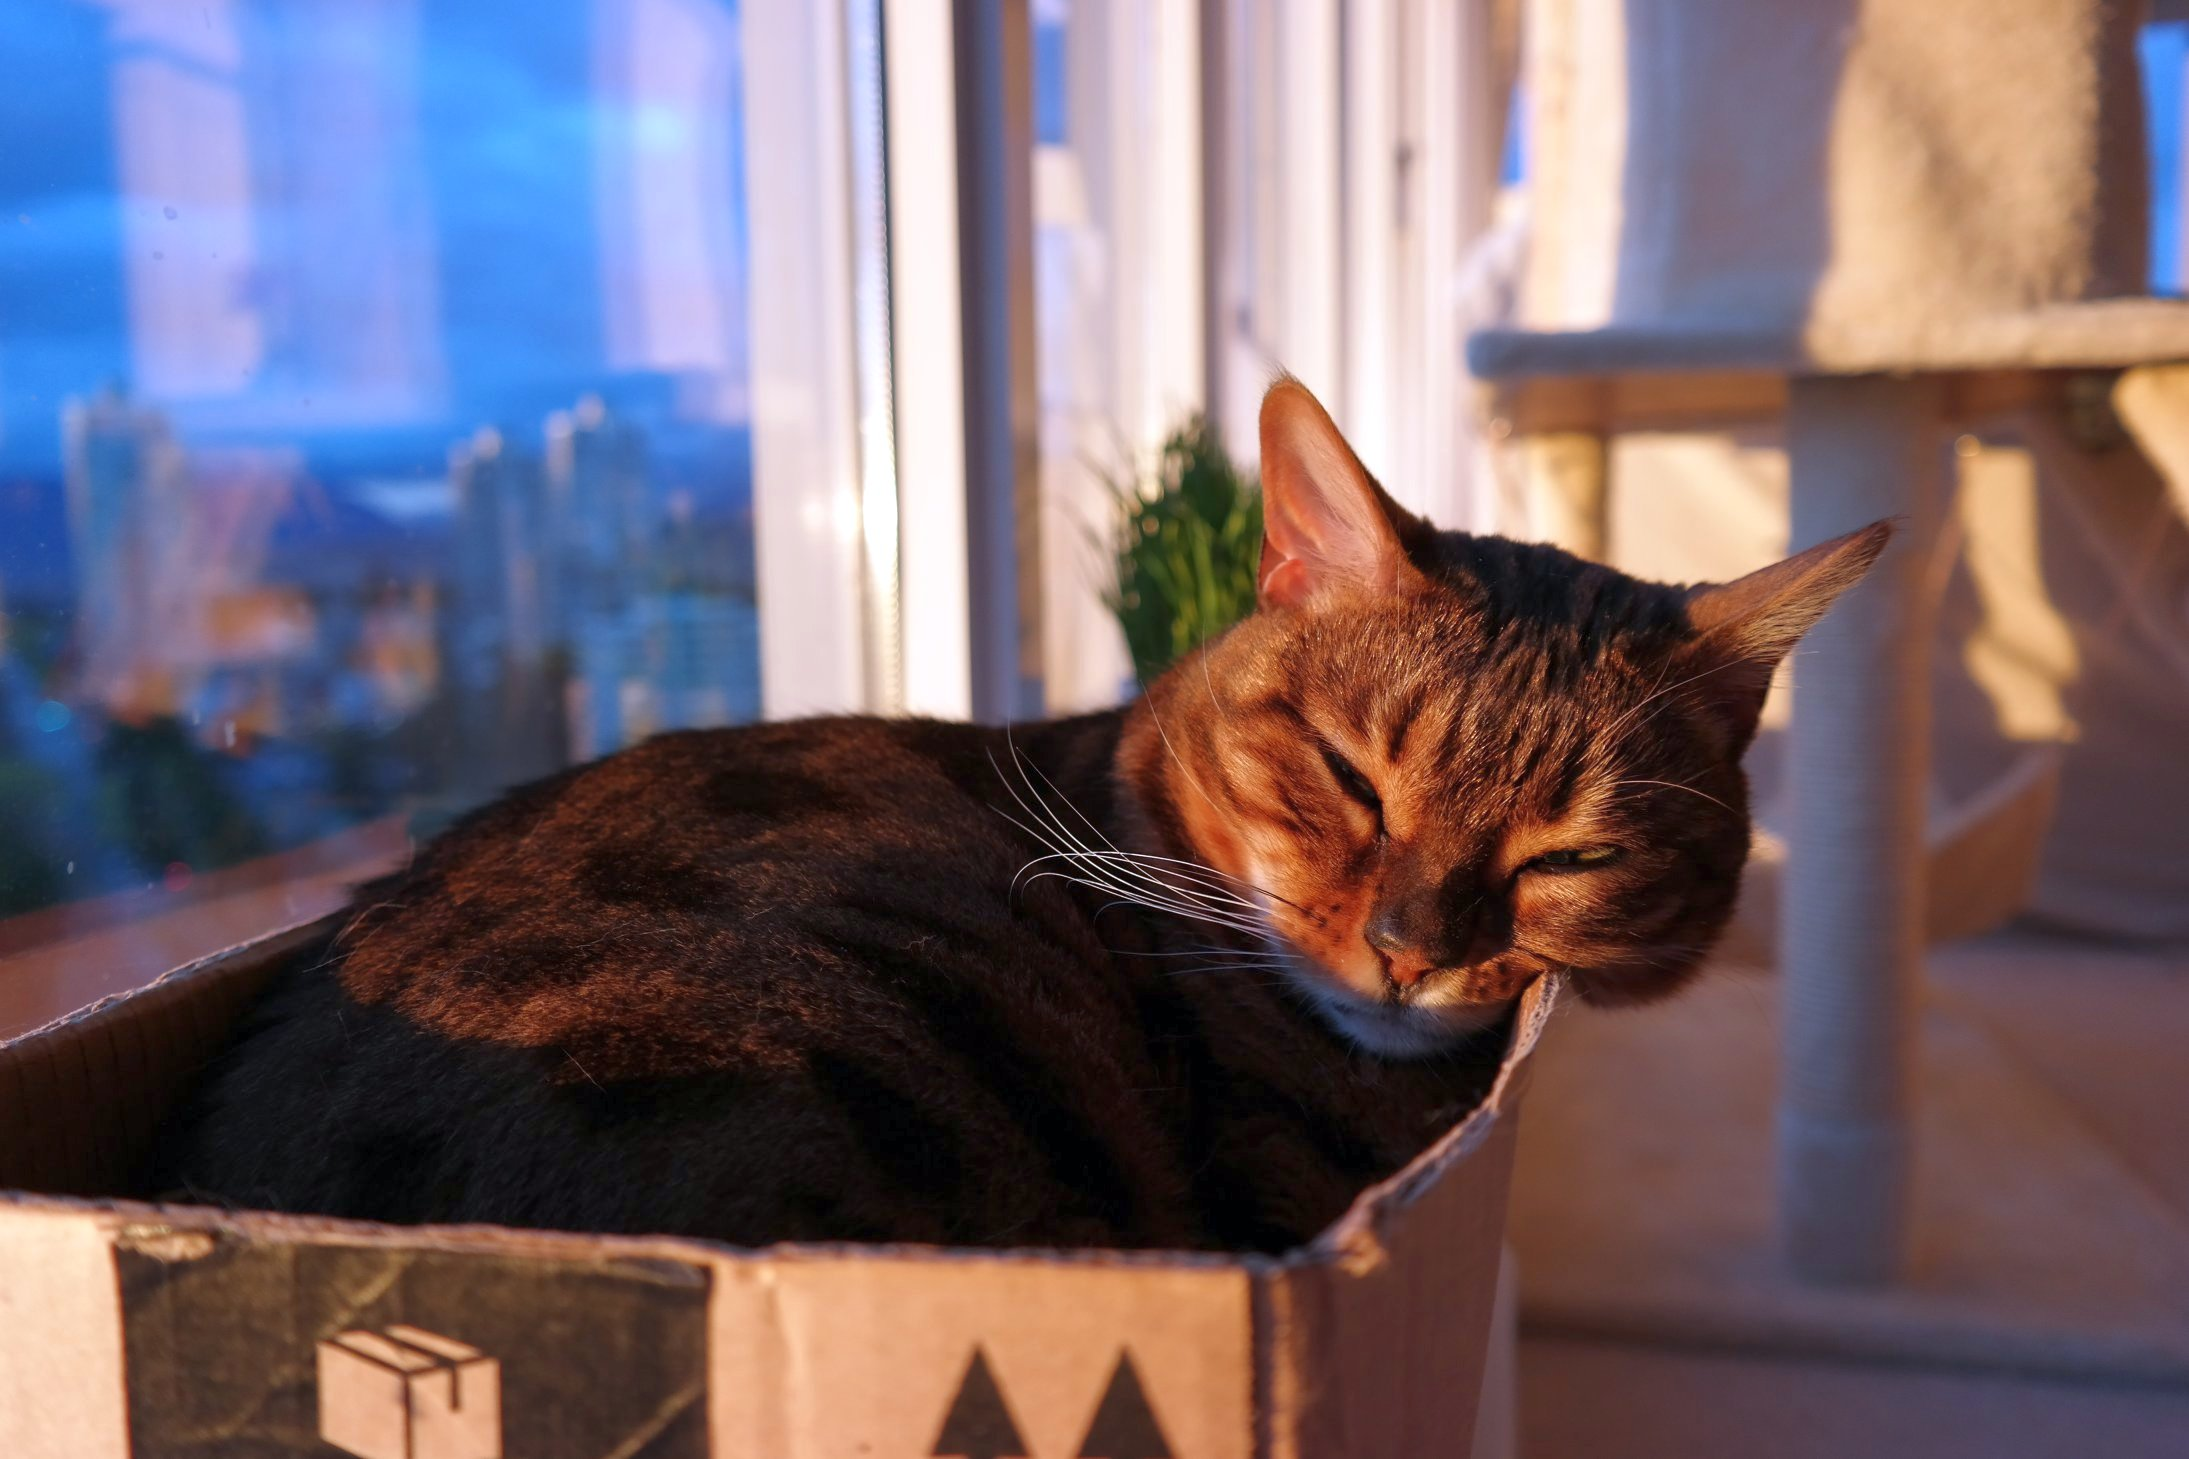 Happy Emma sleeping in her favorite studio apartment